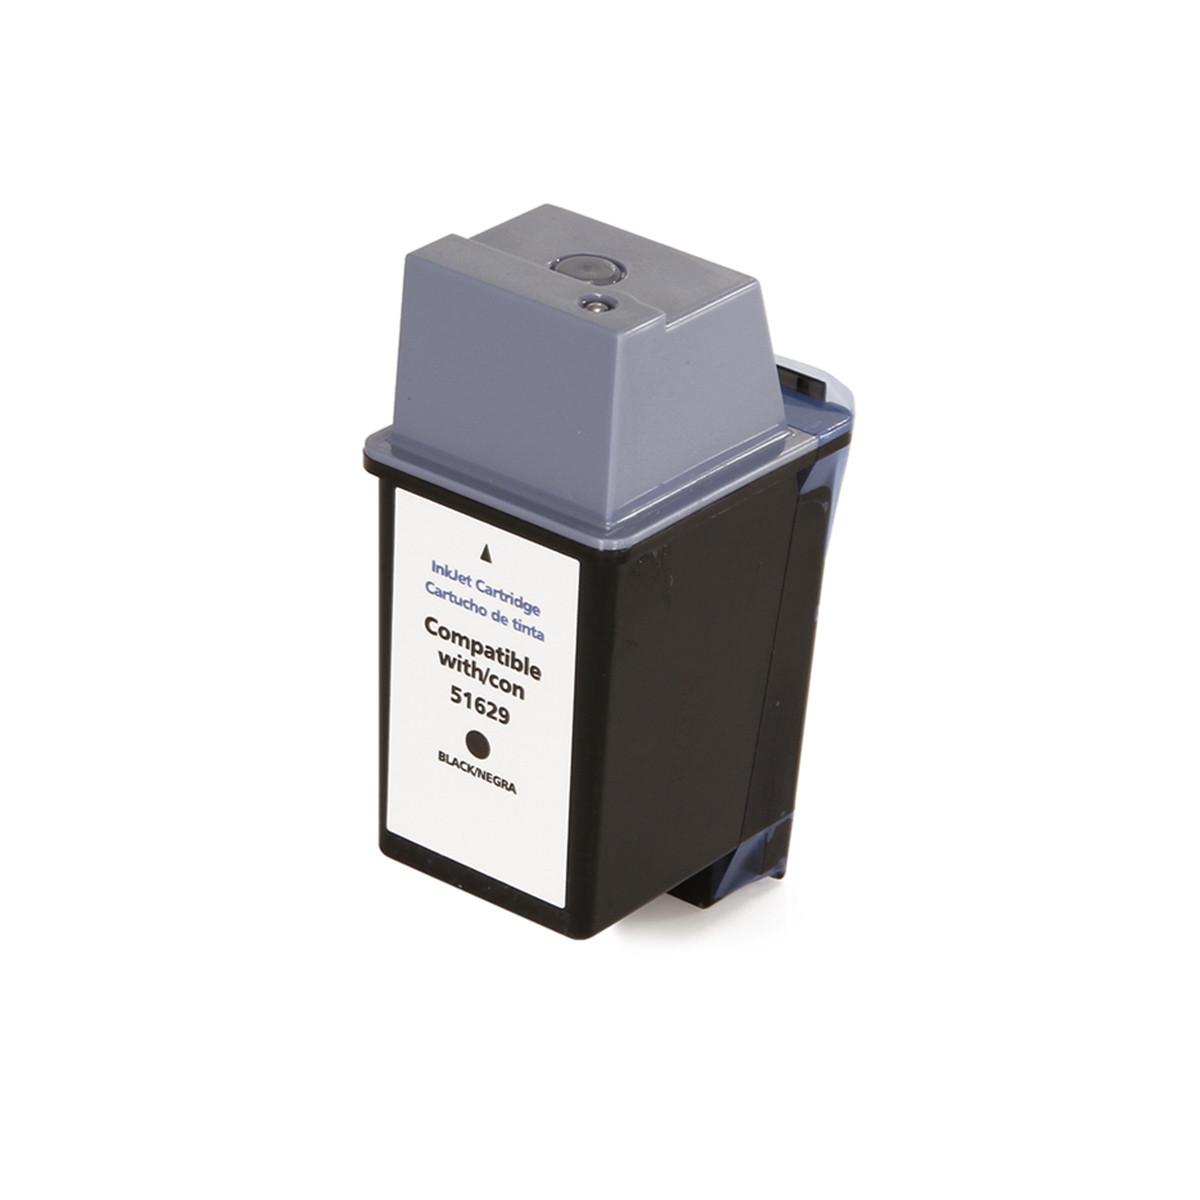 Cartucho de Tinta Compatível com HP 29 51629 Preto | Deskjet 600 Officejet 500 PSC-370 Fax 910 38ml